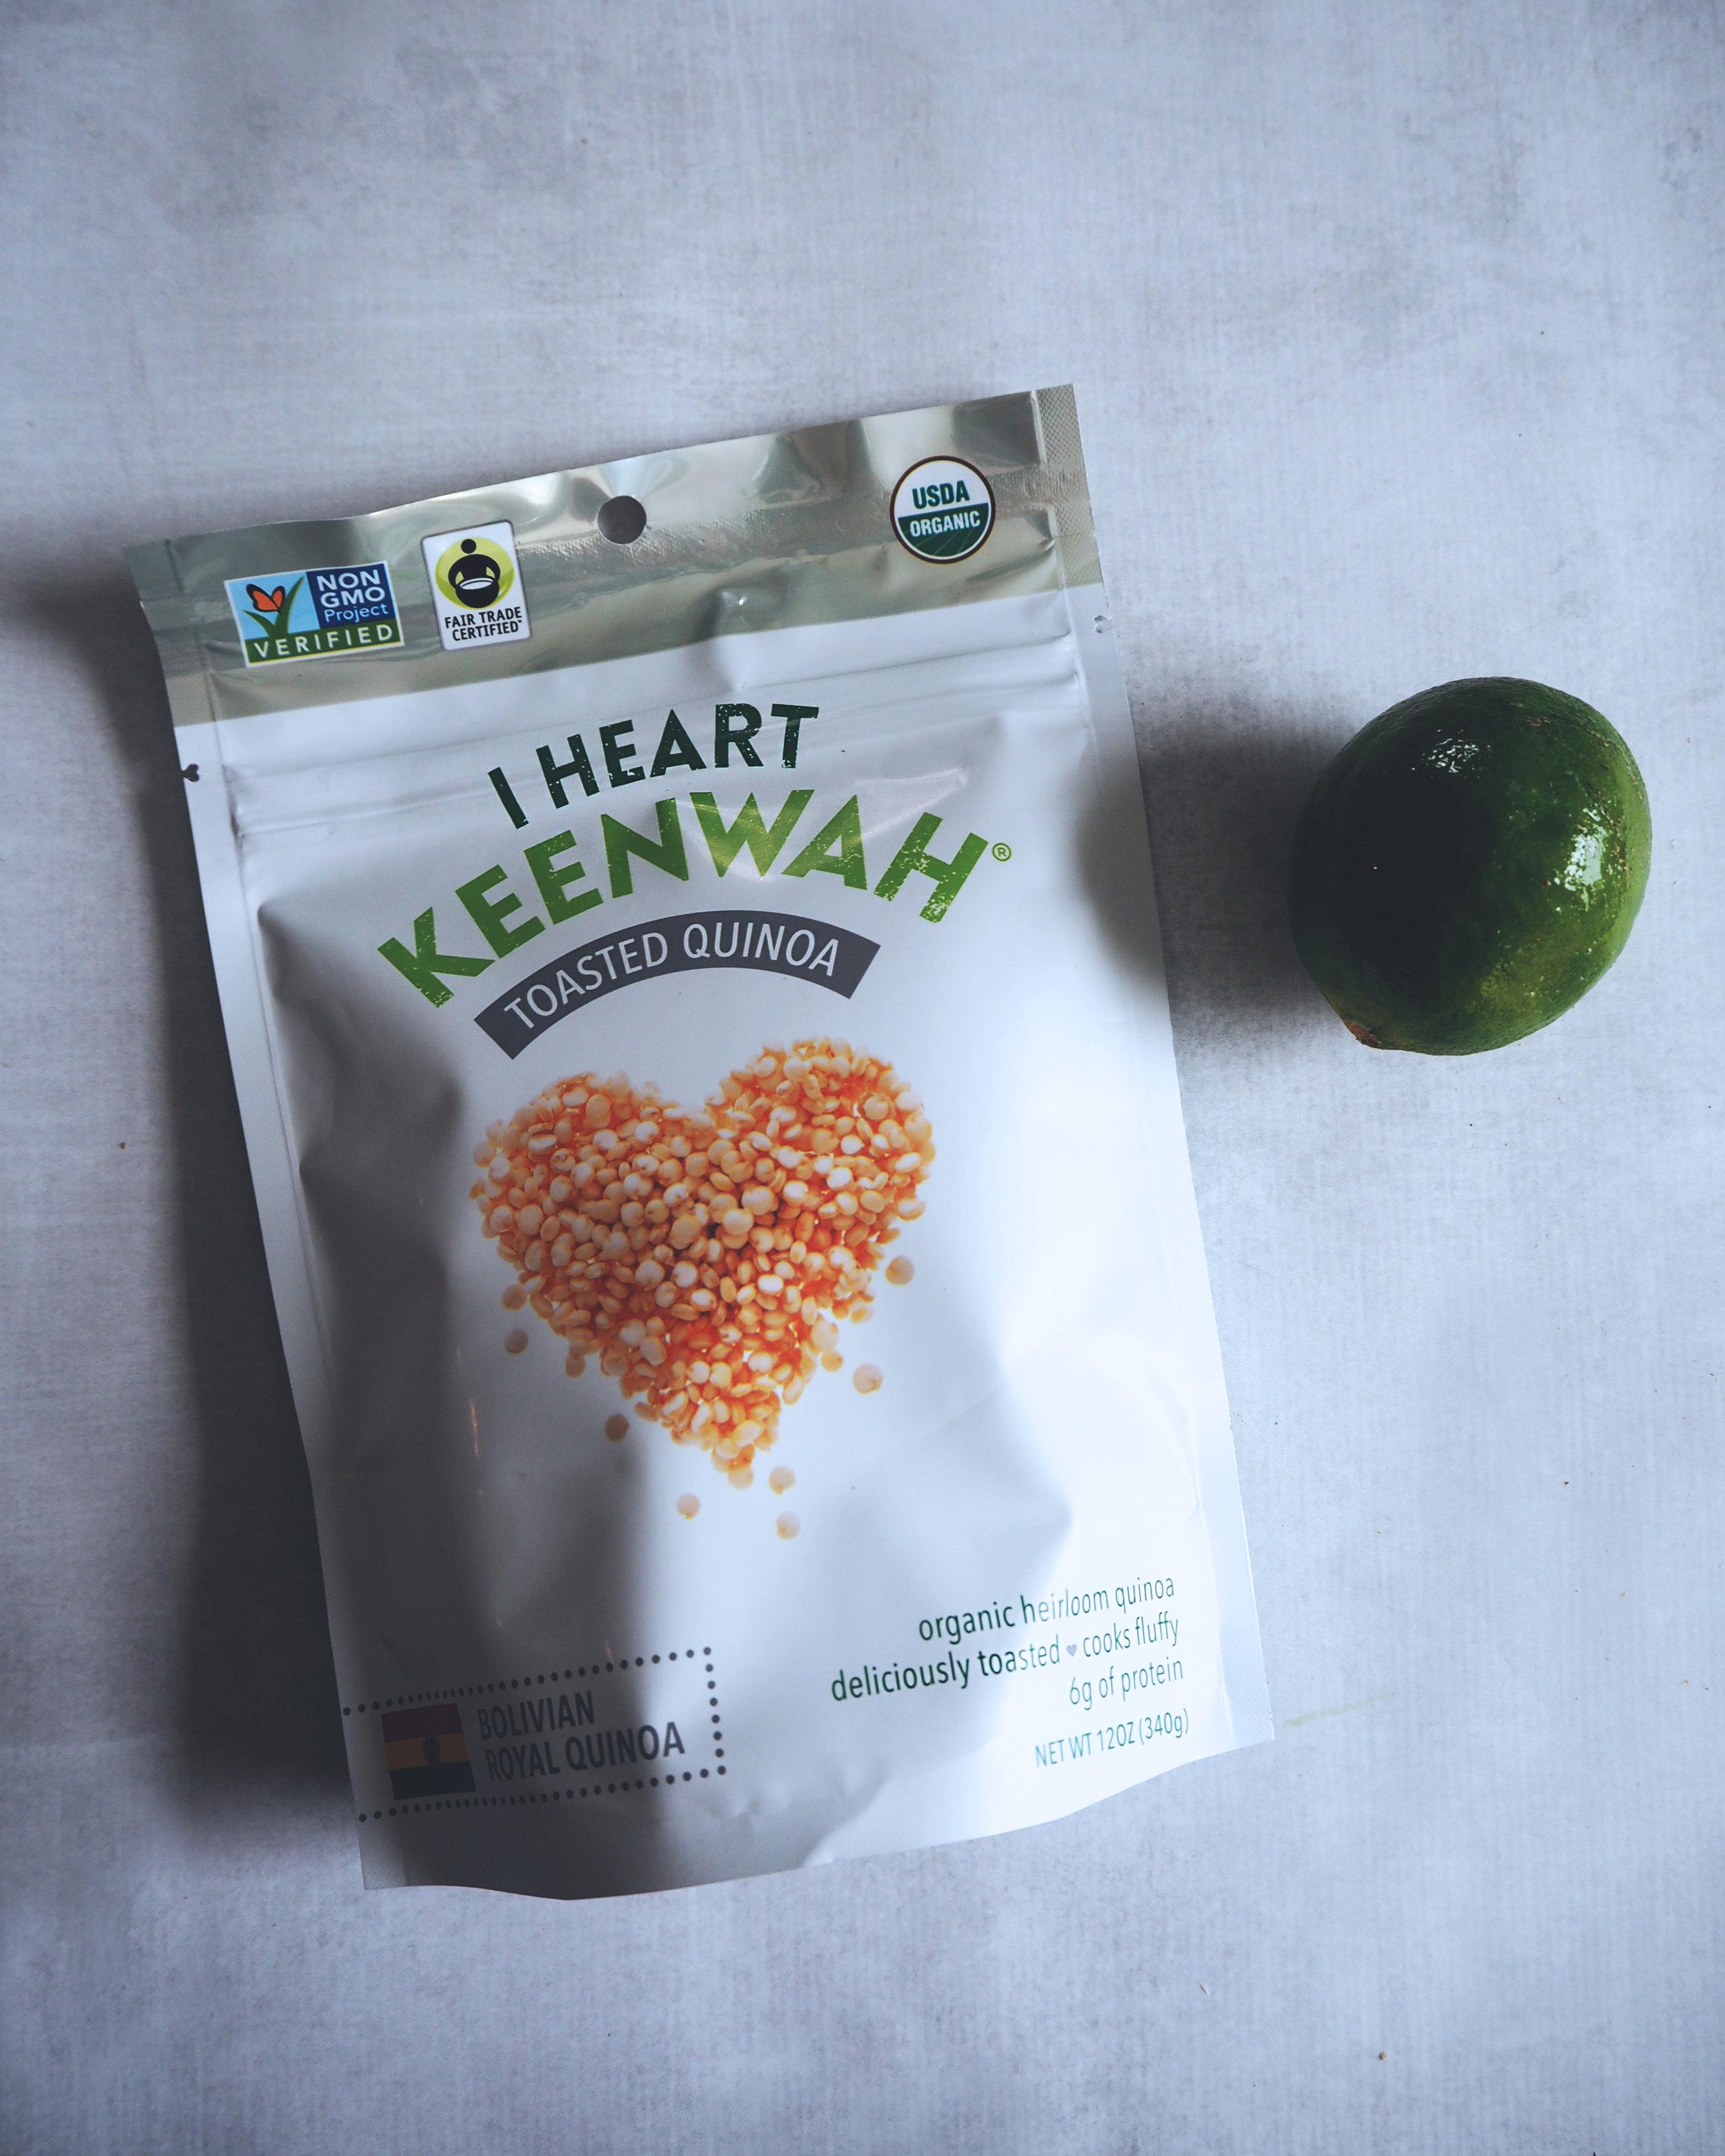 IHeartKeenwah by Whitespace and Wellness